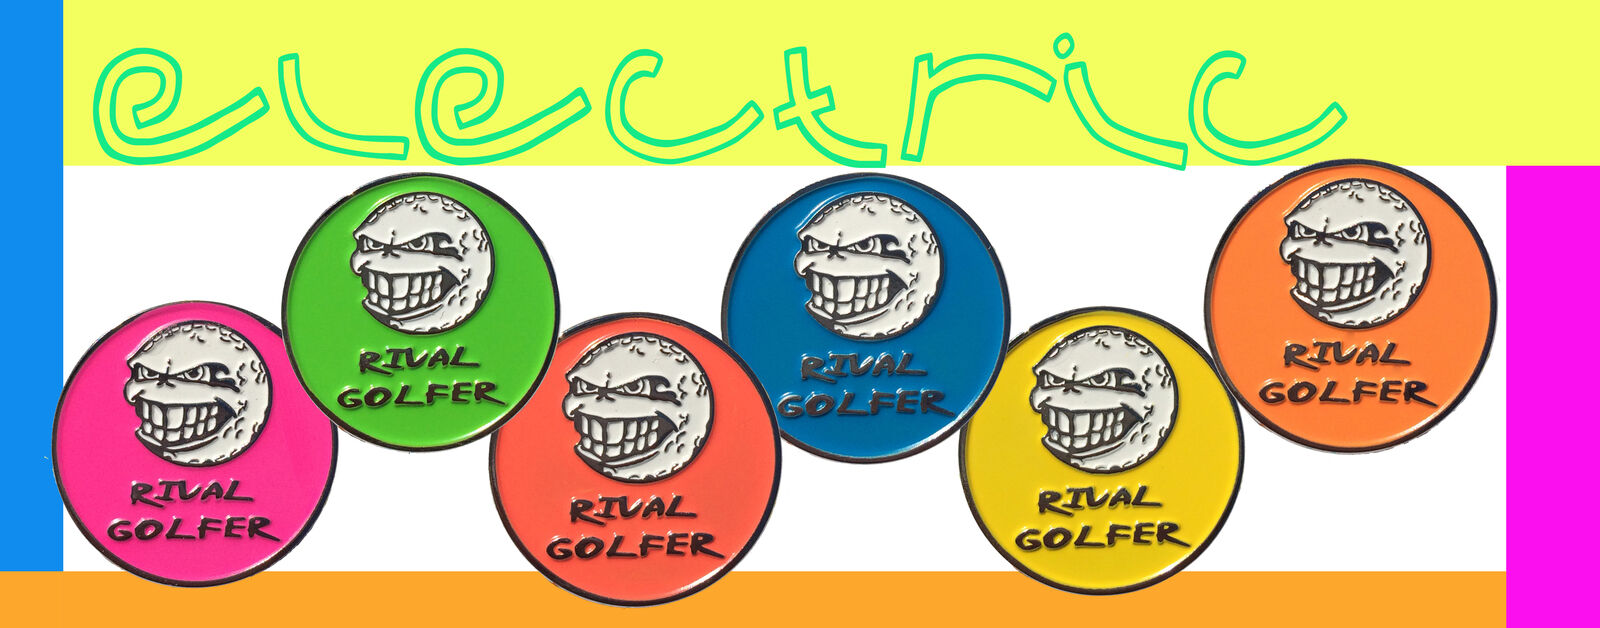 Rival Golfer